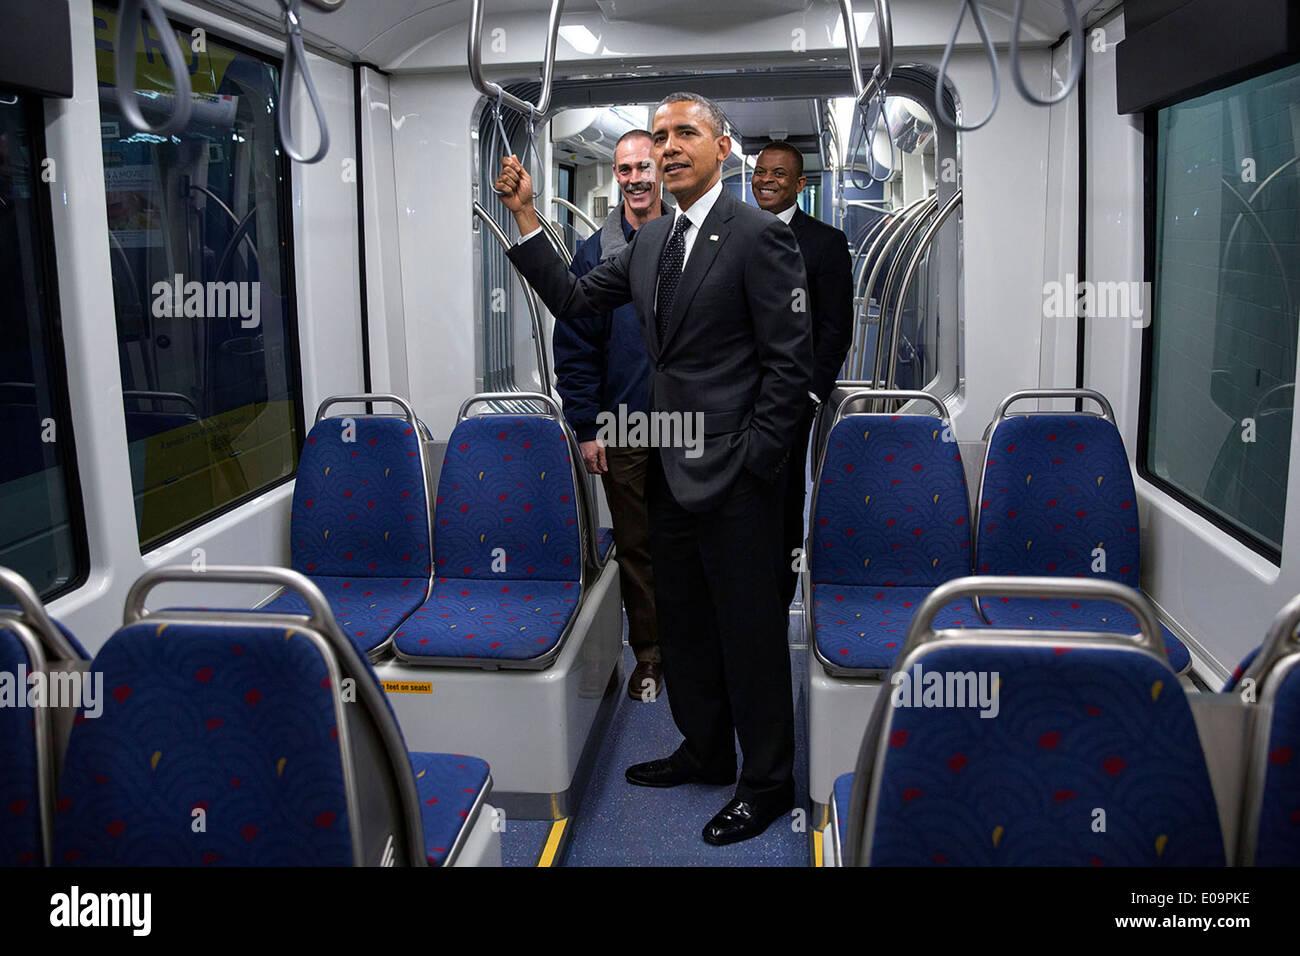 us president barack obama and transportation secretary anthony foxx stock photo 69056834 alamy. Black Bedroom Furniture Sets. Home Design Ideas